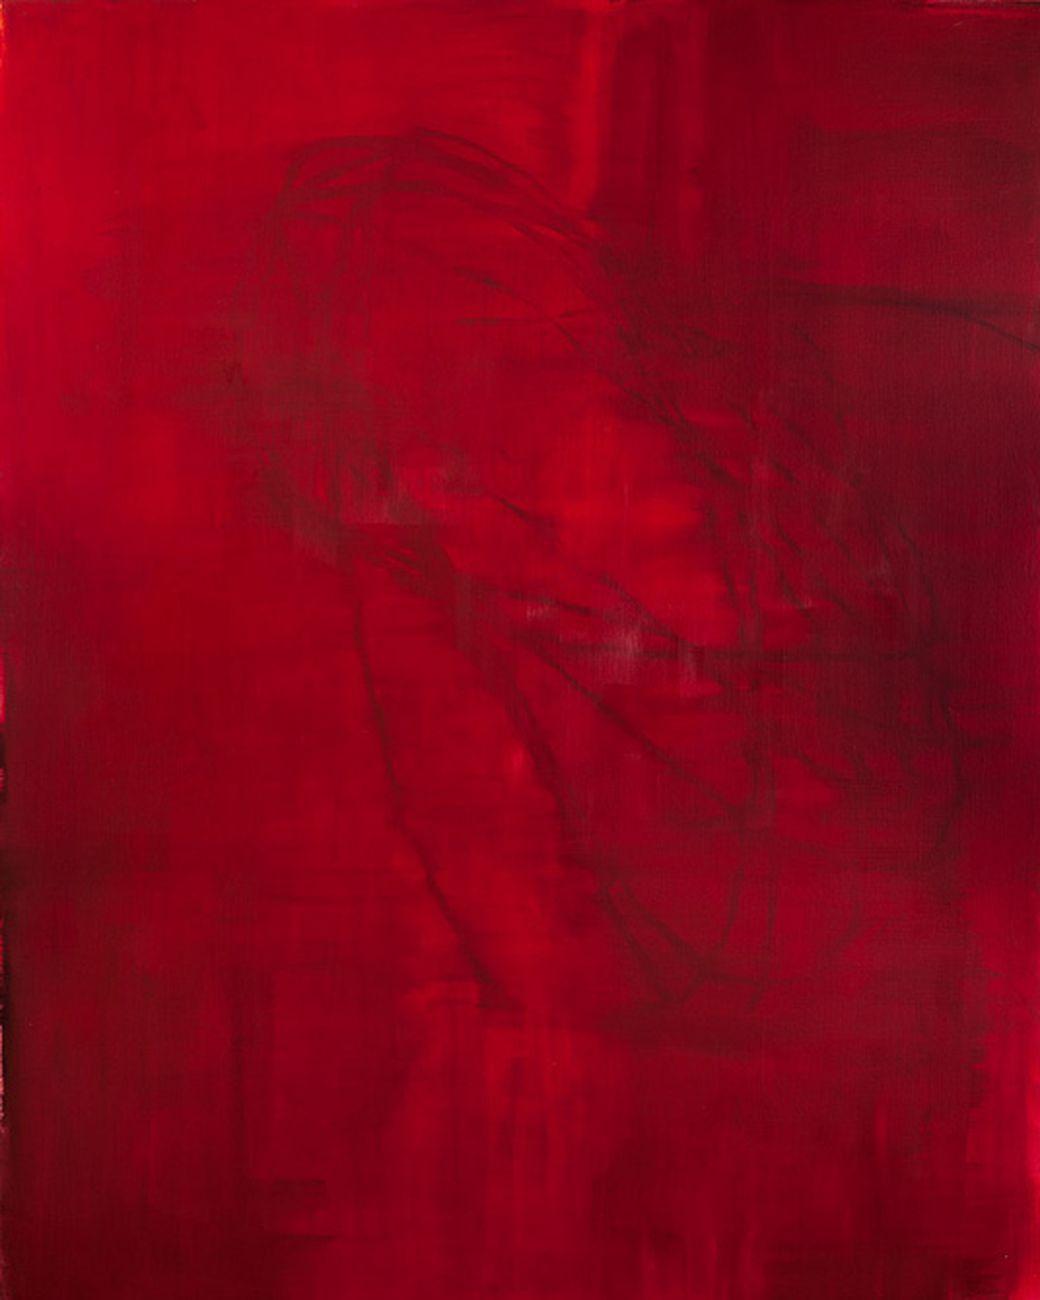 Alessandro Sarra, Senza titolo 01 M, 2012, olio su tela, cm 200x160